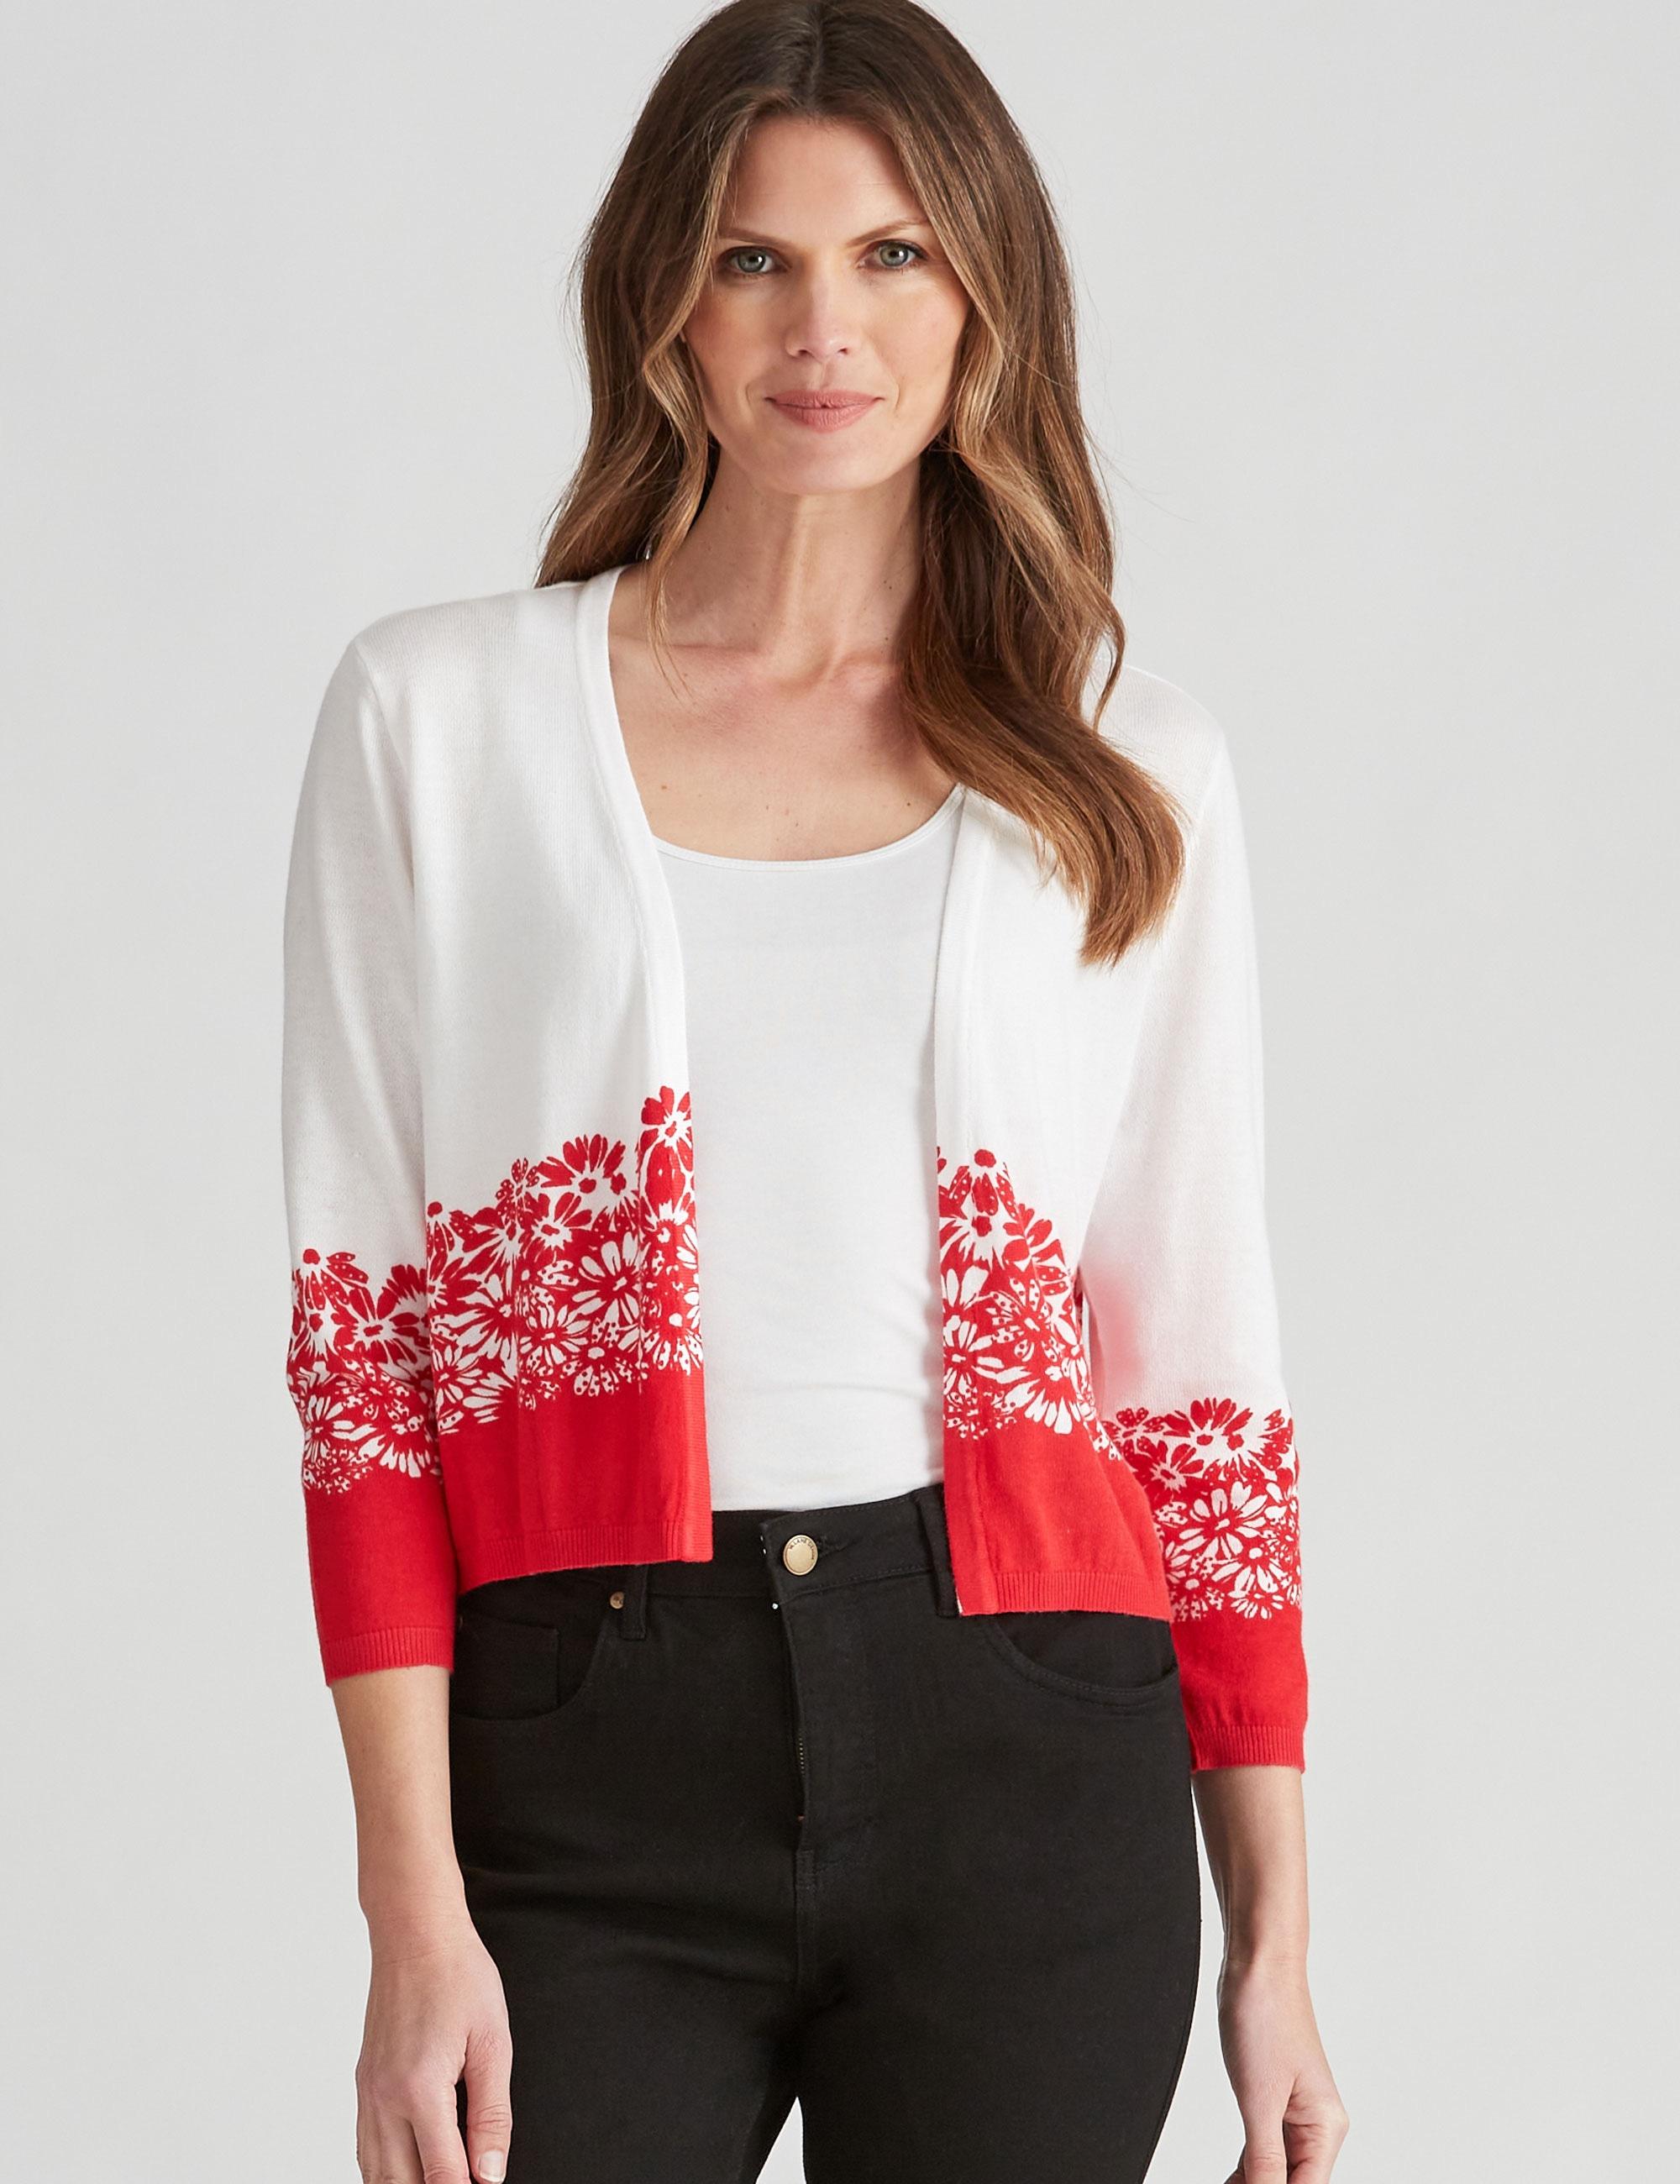 1055324610 1 - Women Fashion